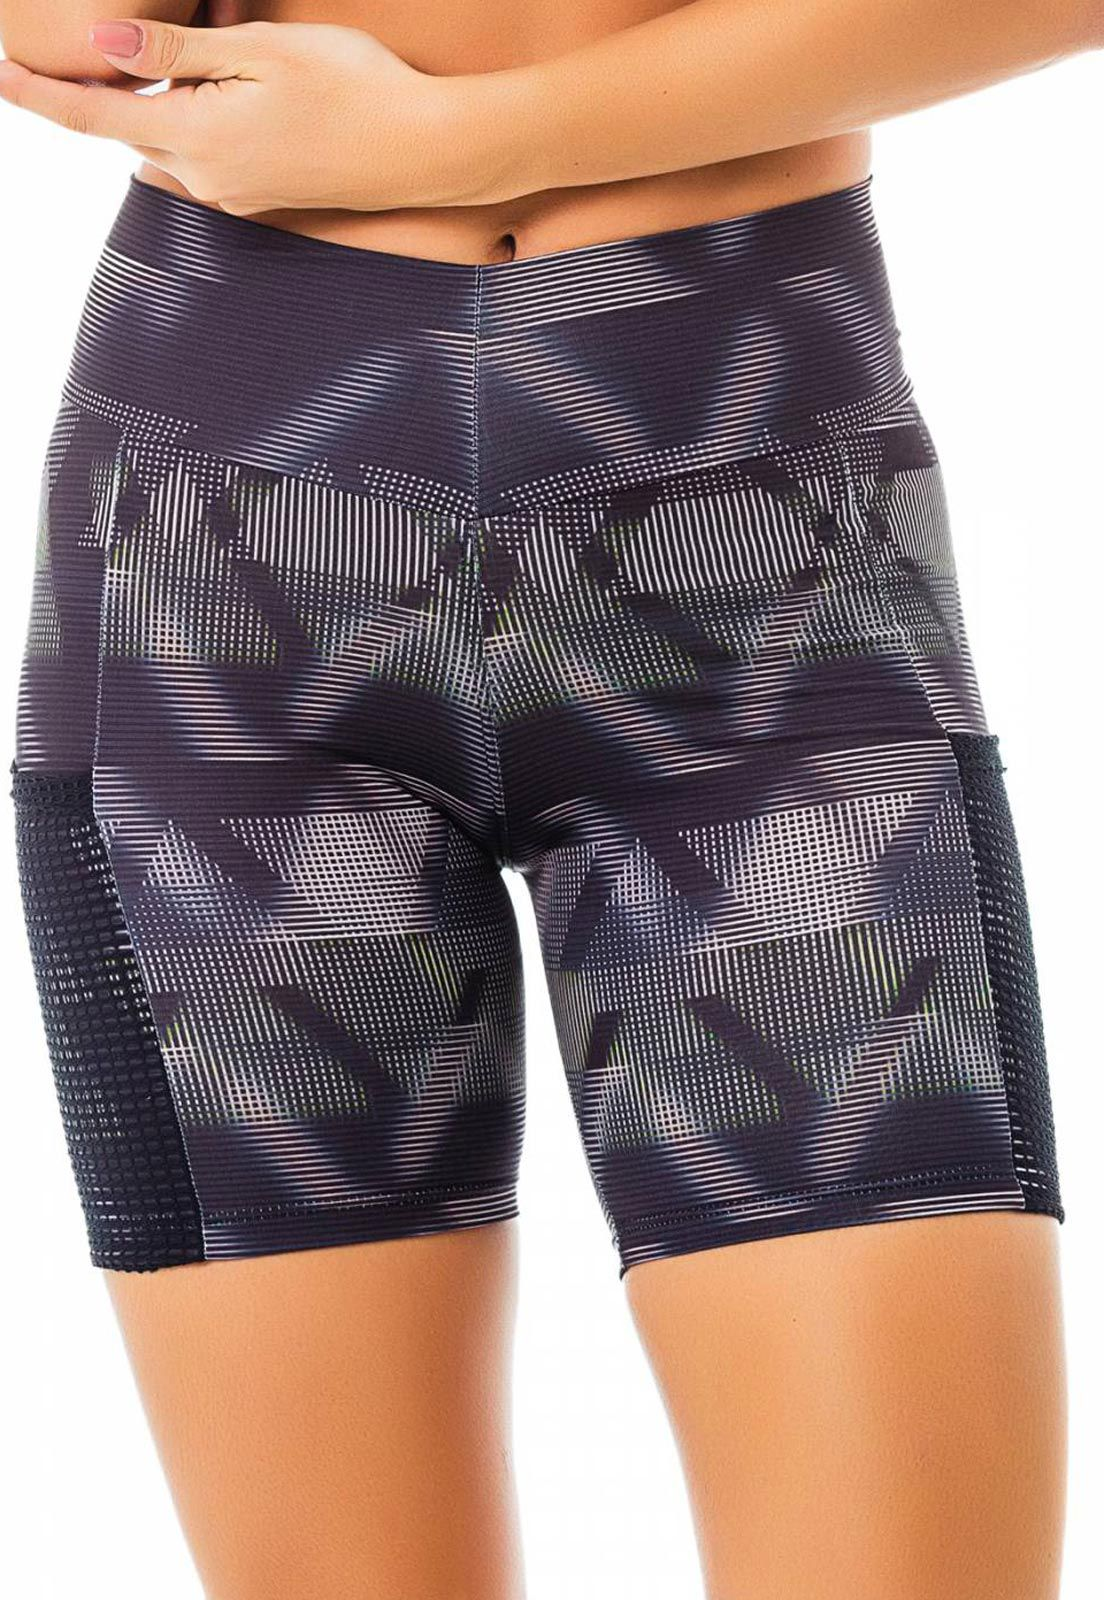 Shorts Fitness Flavia Donadio Beachwear Laguna Preto